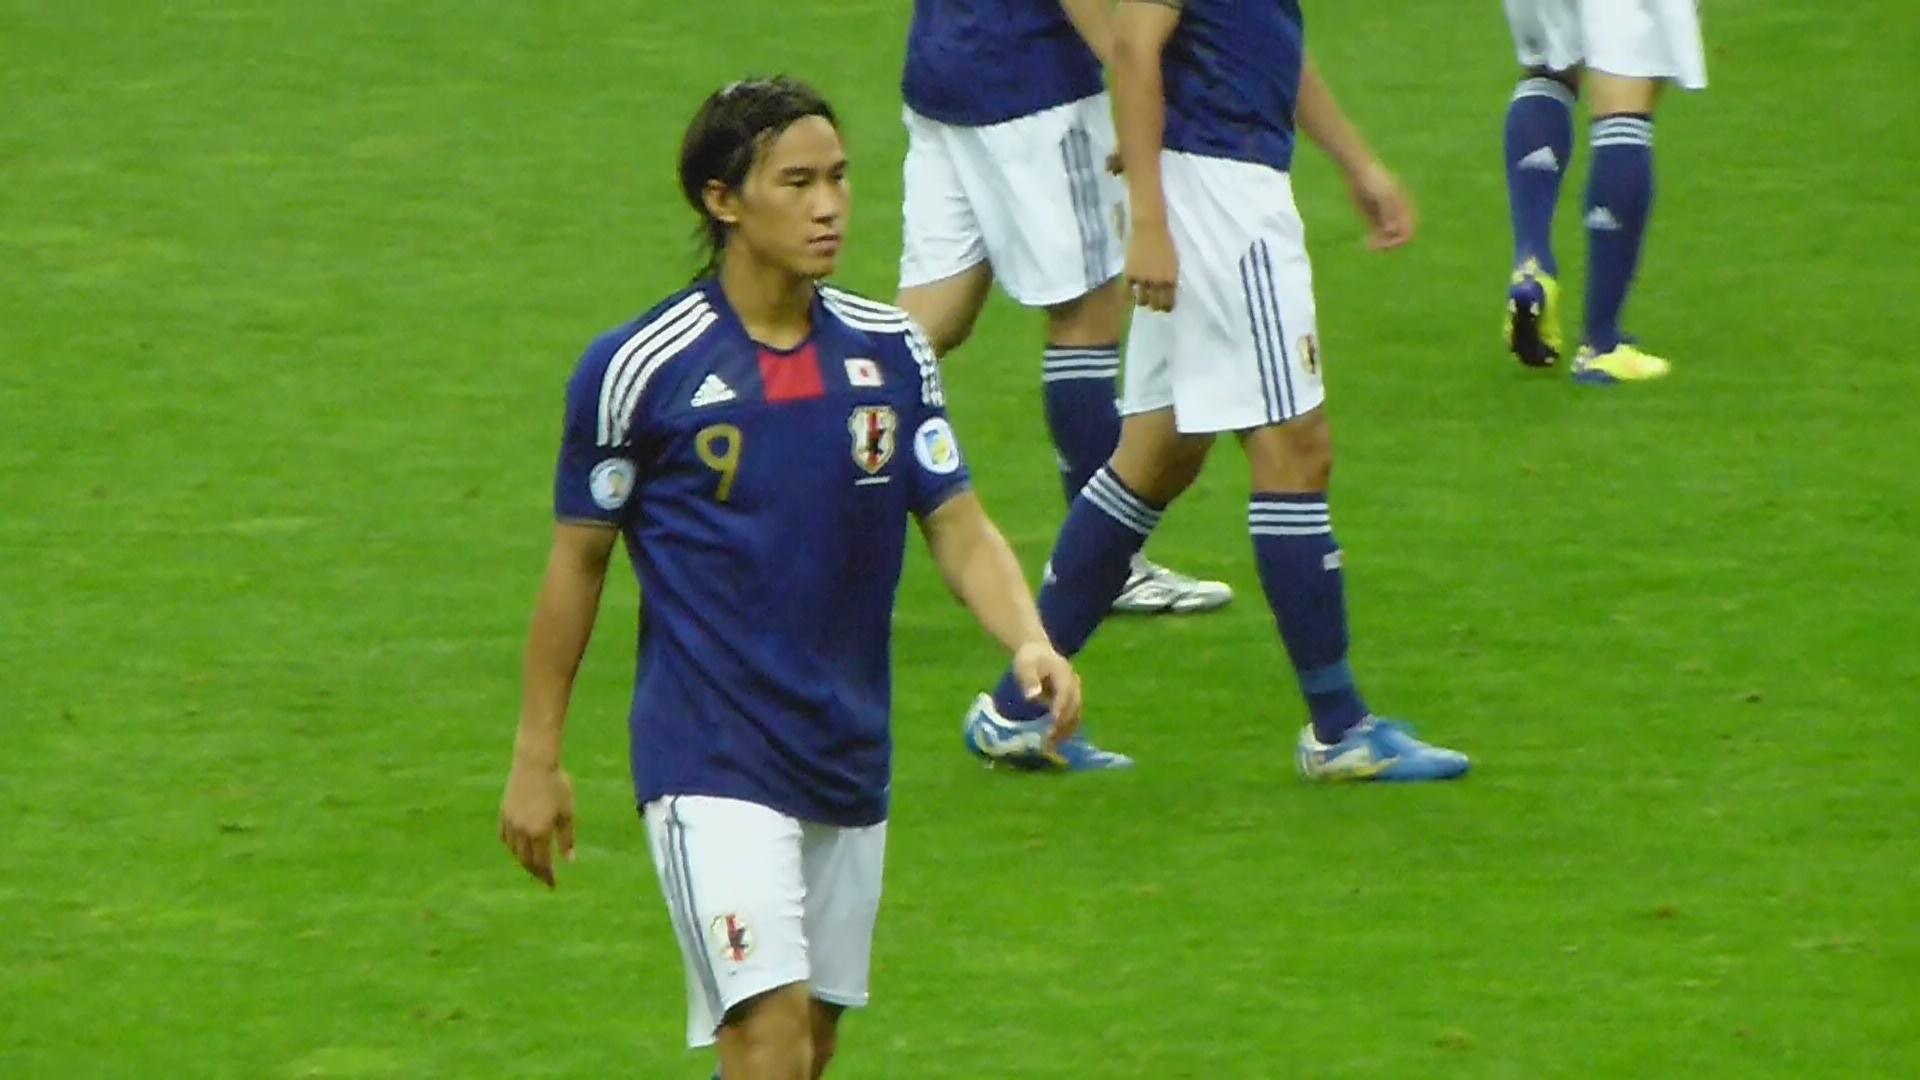 岡崎慎司 画像 サッカー日本代表 画像